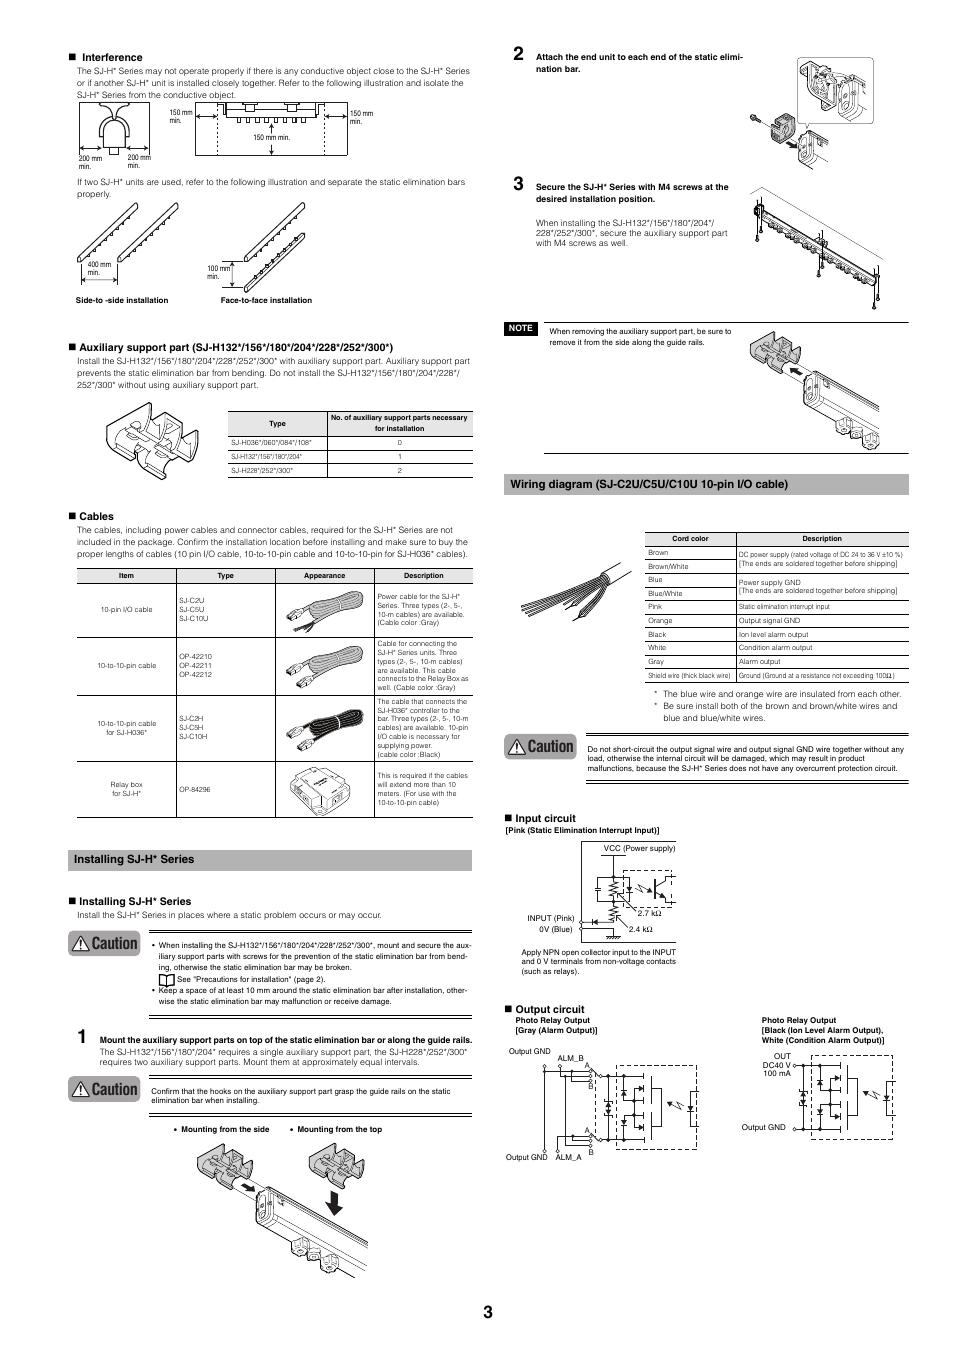 installing sj h series wiring diagram sj c2u c5u c10u. Black Bedroom Furniture Sets. Home Design Ideas